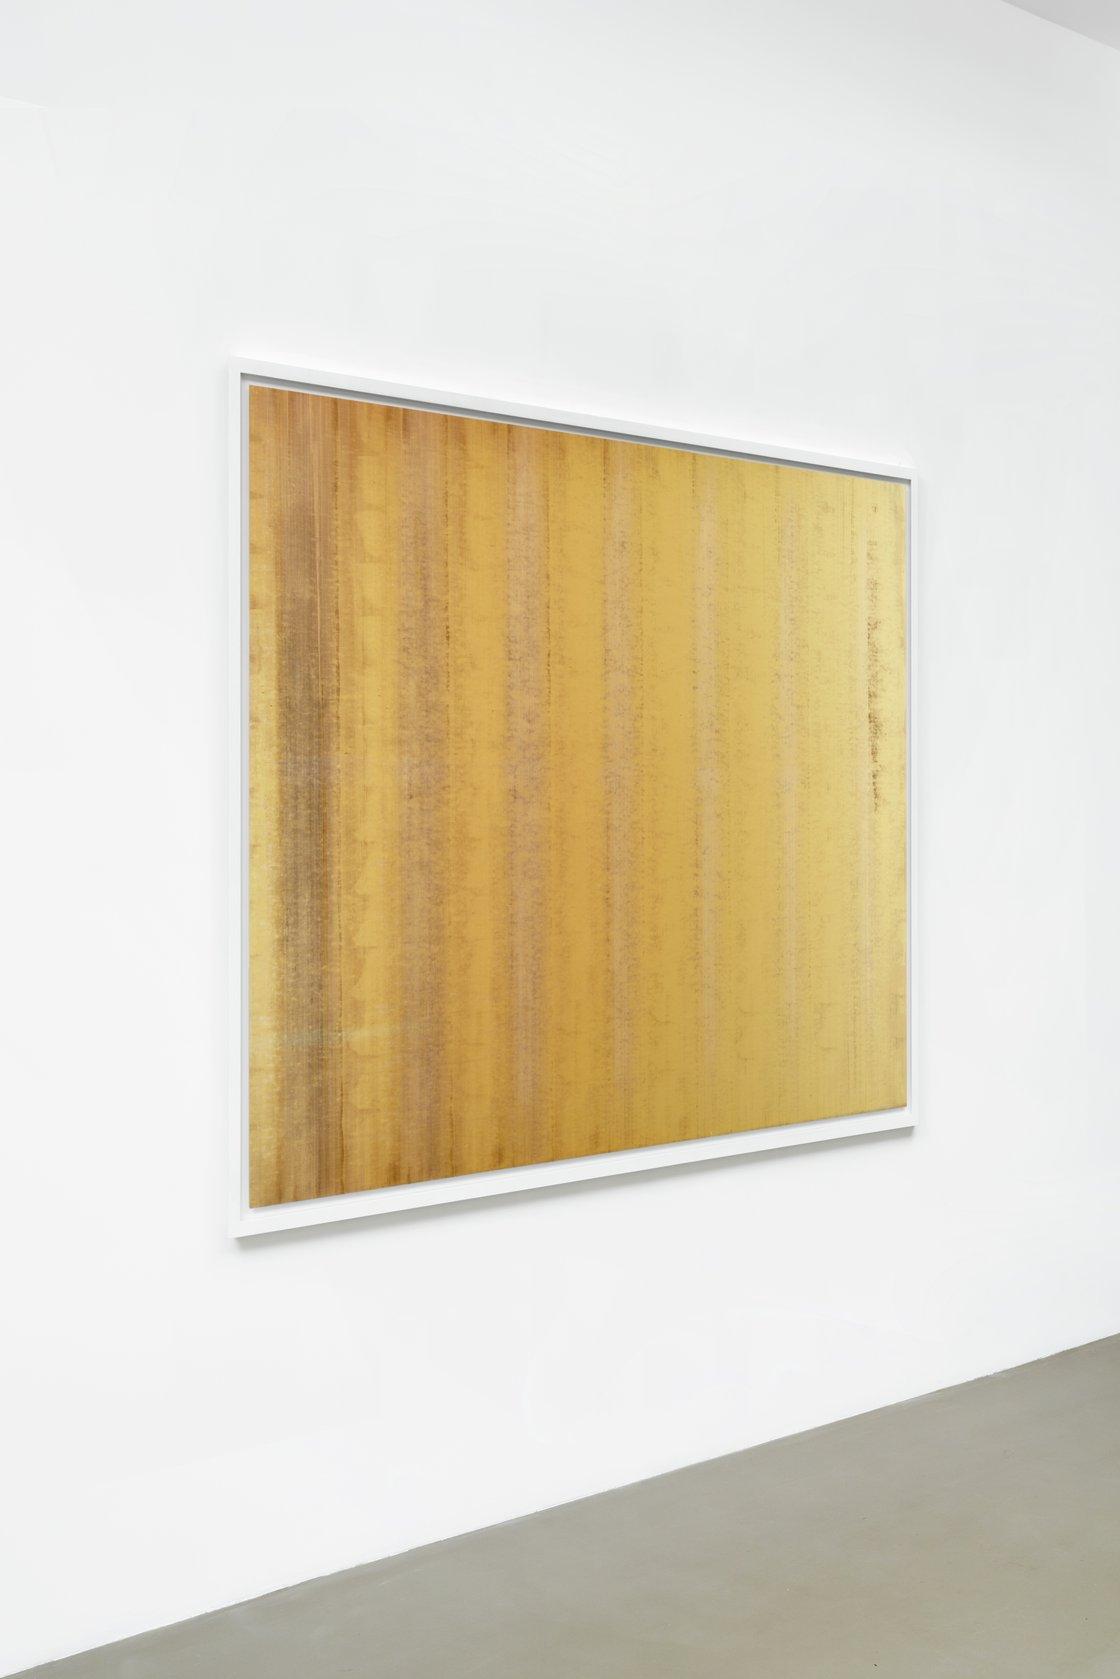 Wolfgang Tillmans, Silver 263, 2009